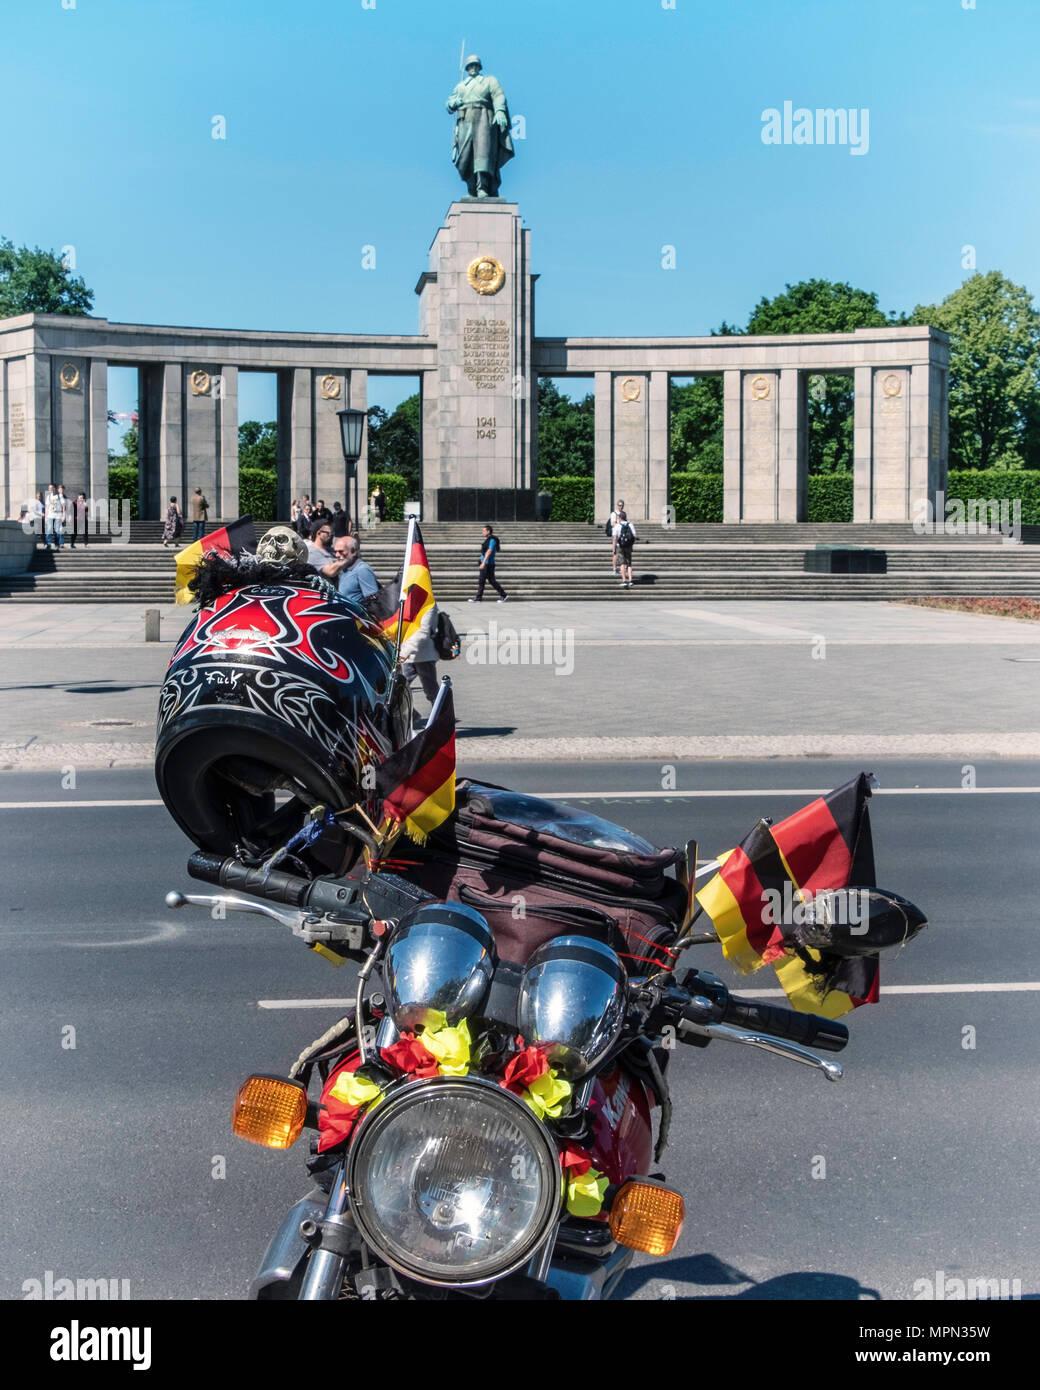 Berlin Mitte, Motor bike detail. Parked bike with German flags, helmet & skull in front of Soviet War Memorial  at Bikers Demo. - Stock Image